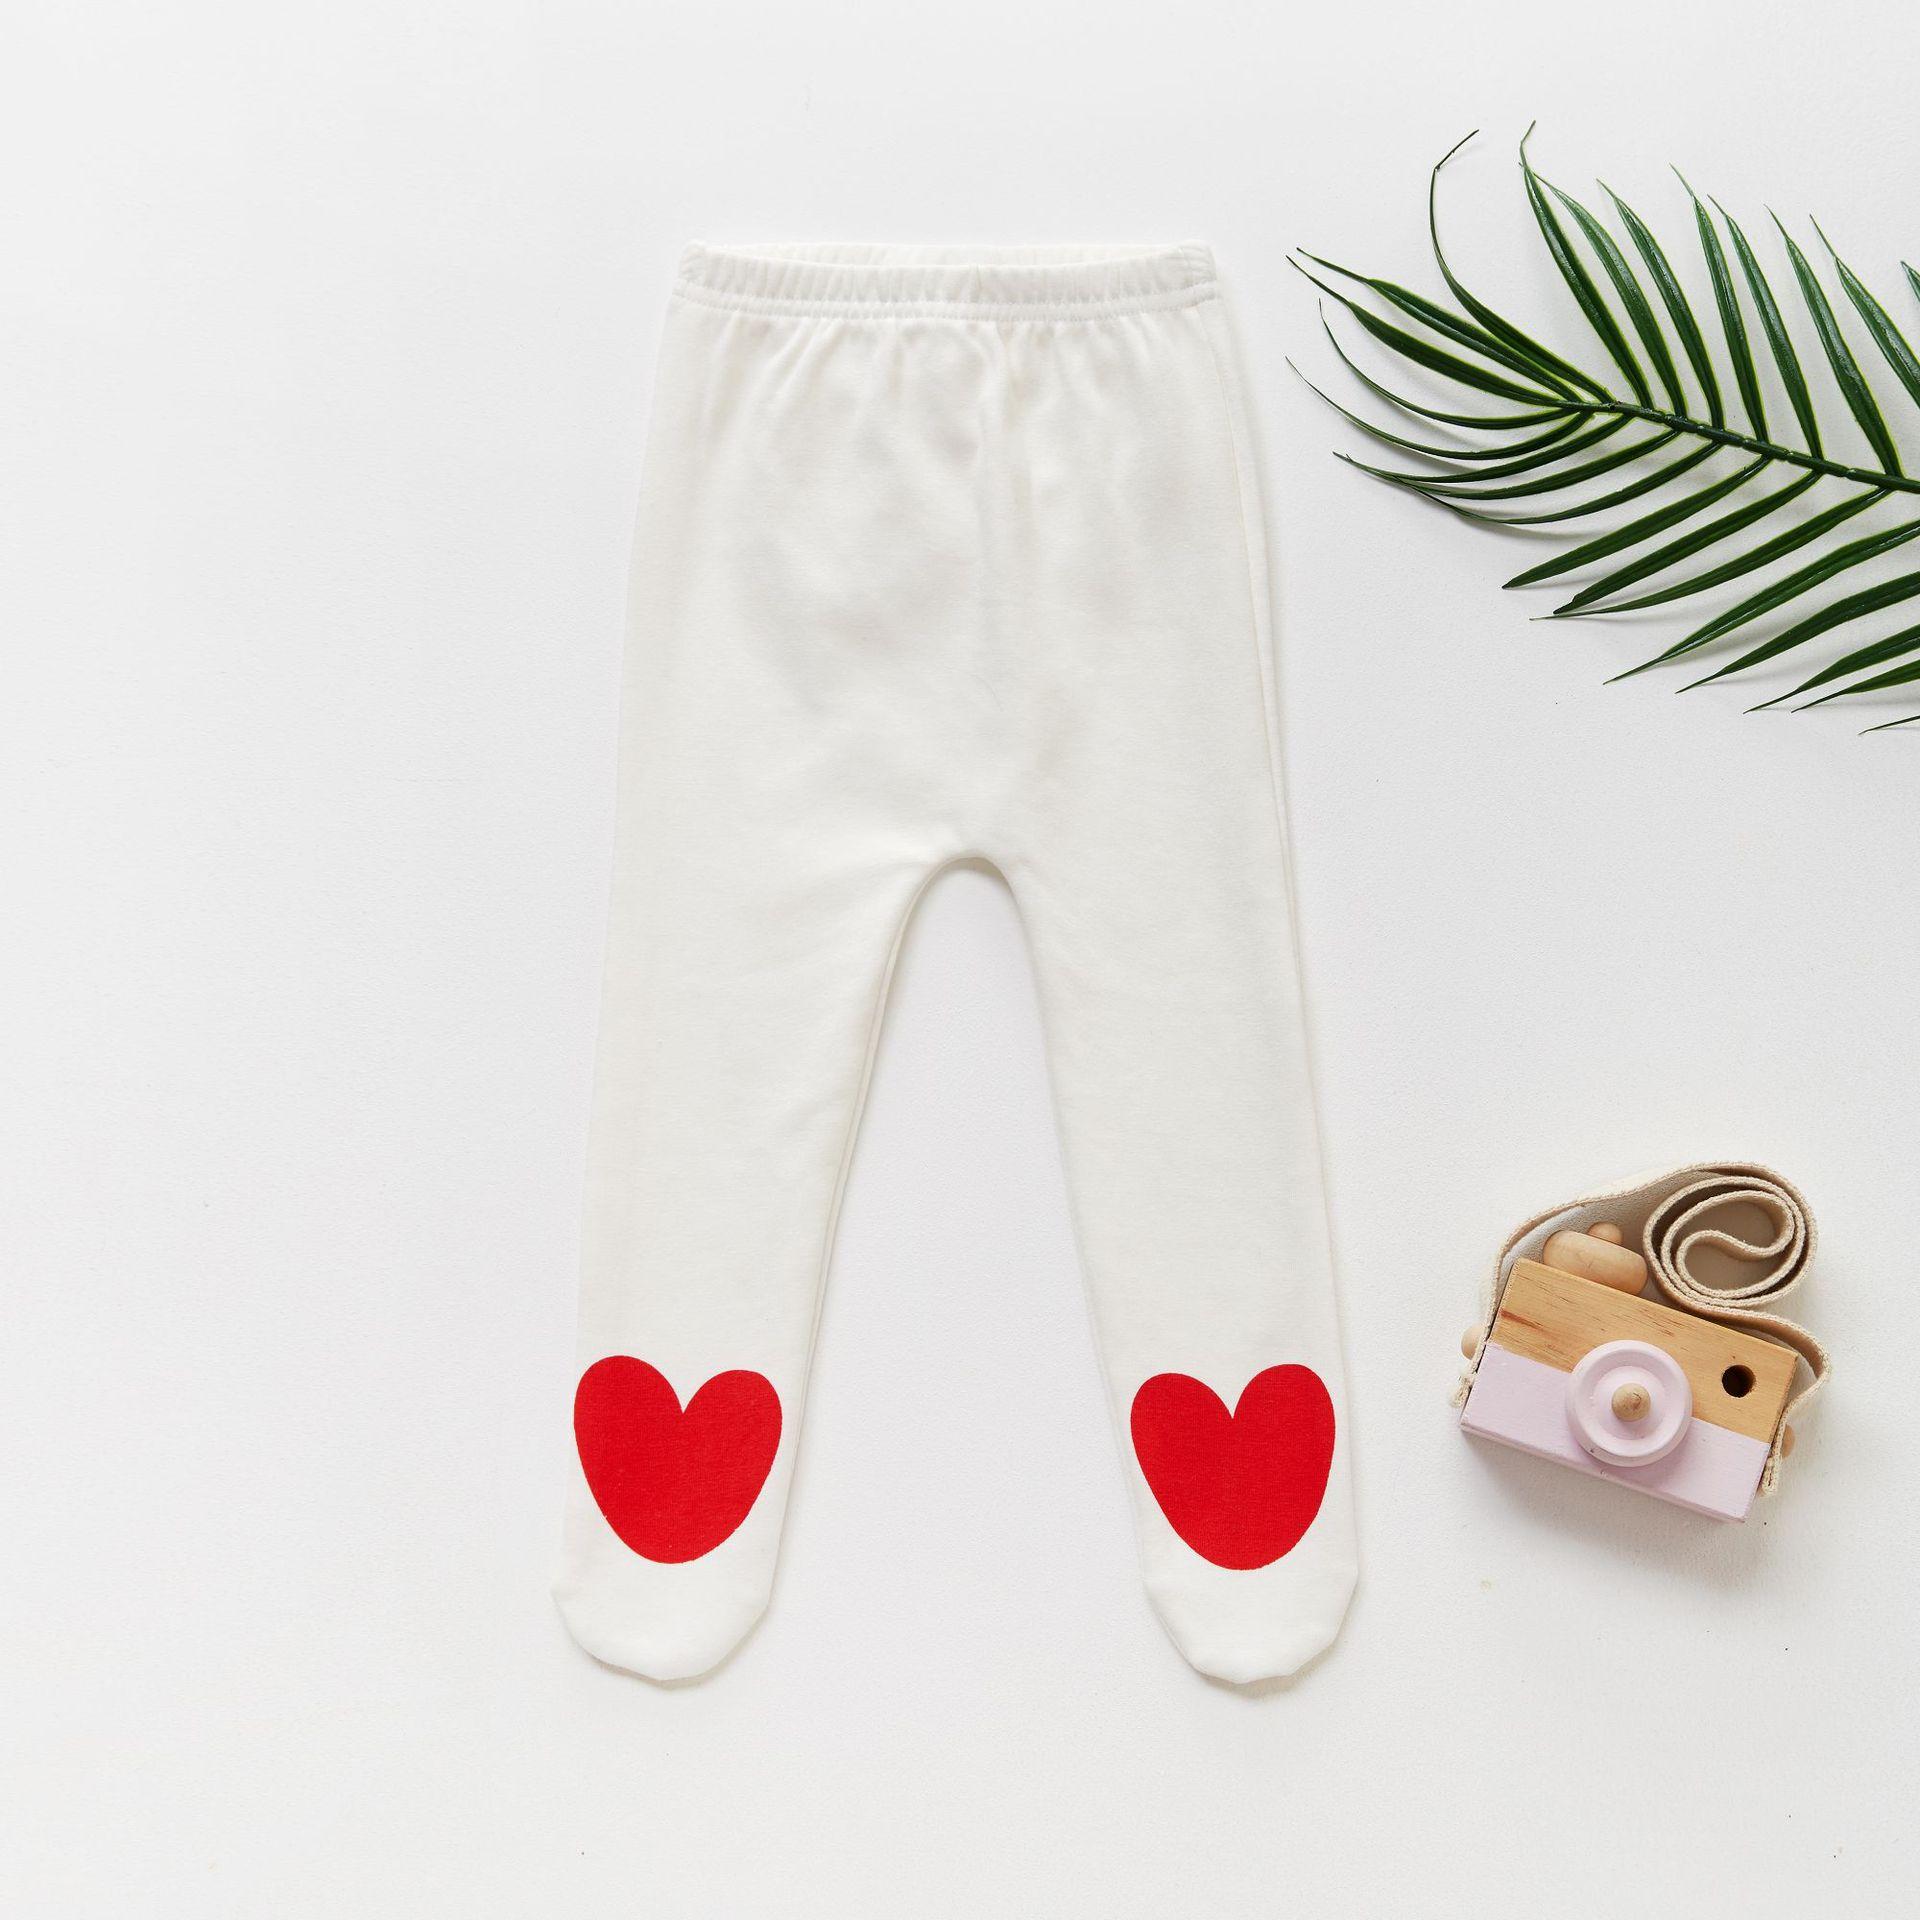 HTB1j20RXrj1gK0jSZFuq6ArHpXab Baby Knitting Rompers Cute Overalls Newborn Baby Girls Boys Clothes Infantil Baby Girl Boy Sleeveless Romper Jumpsuit 0-24m